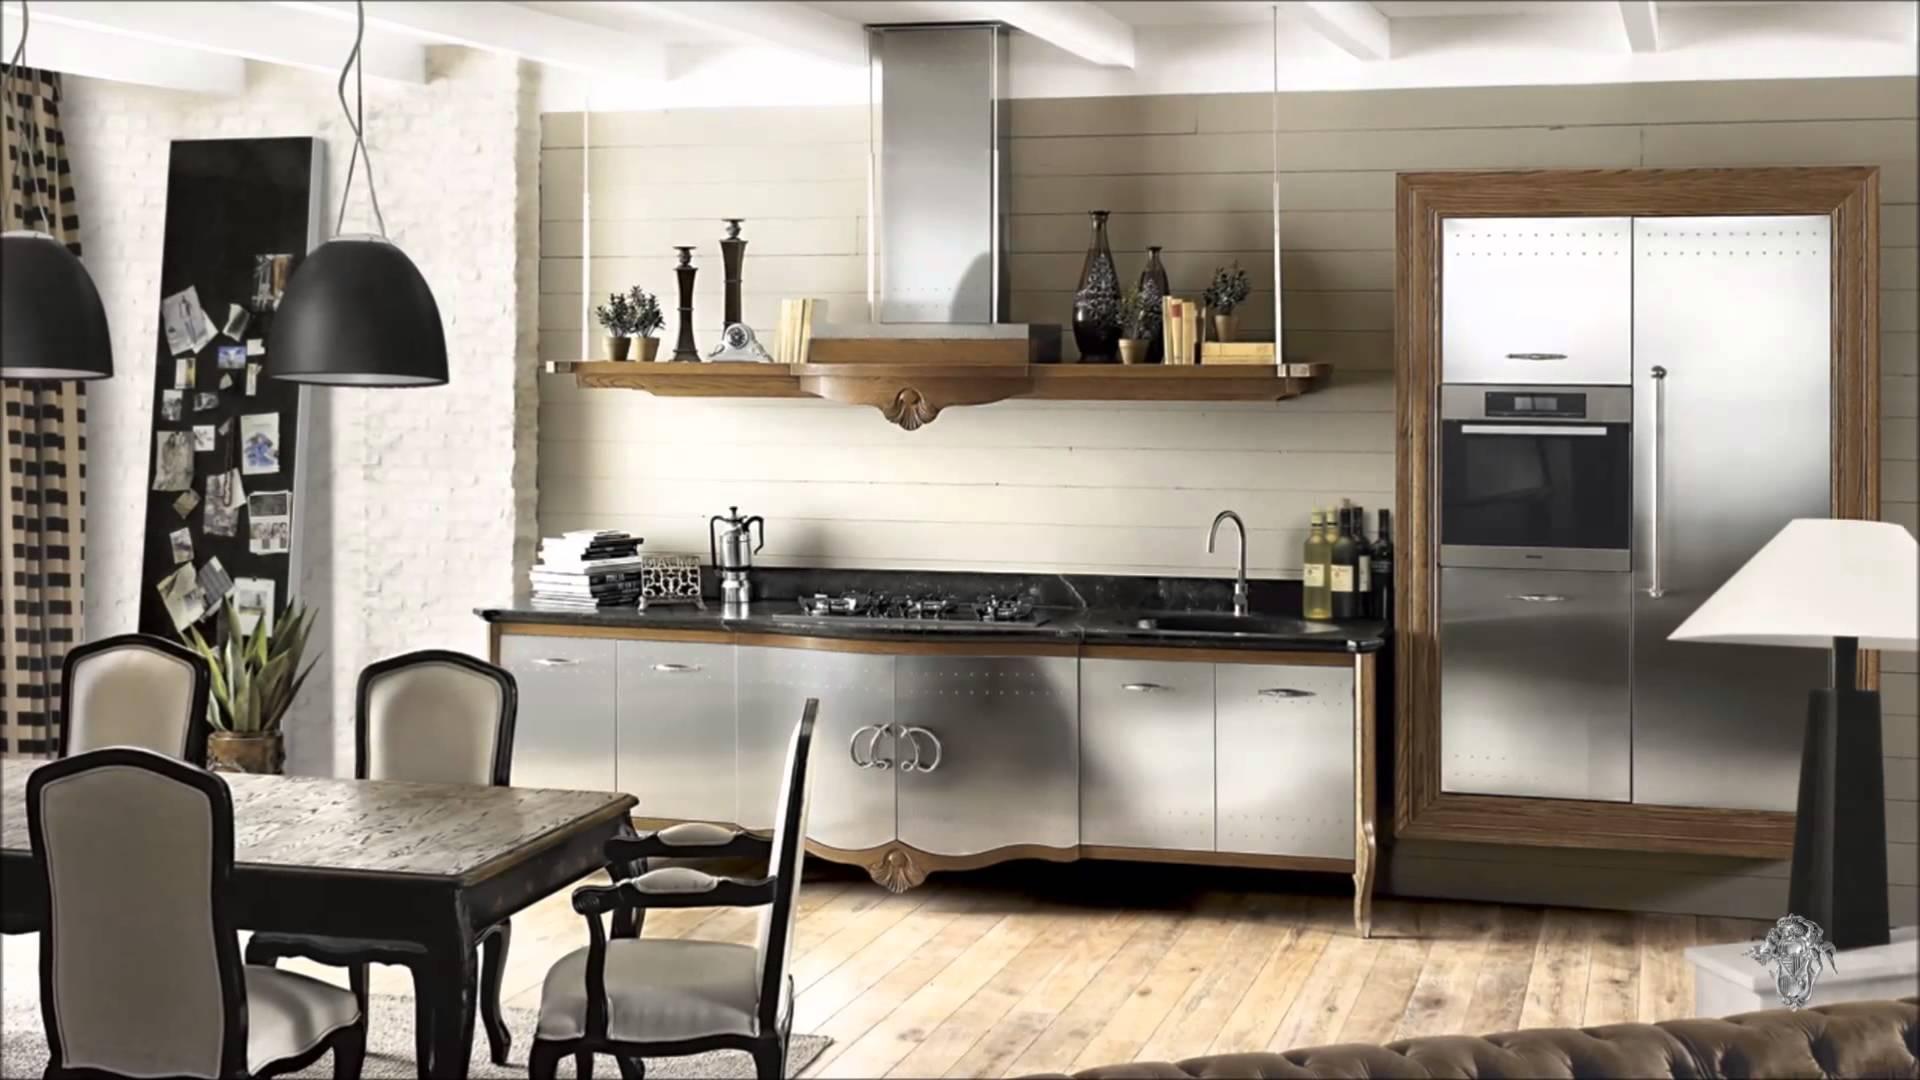 Marchi Group Keuken : تصاميم مطابخ افضل تصاميم وديكورات المطابخ كيف